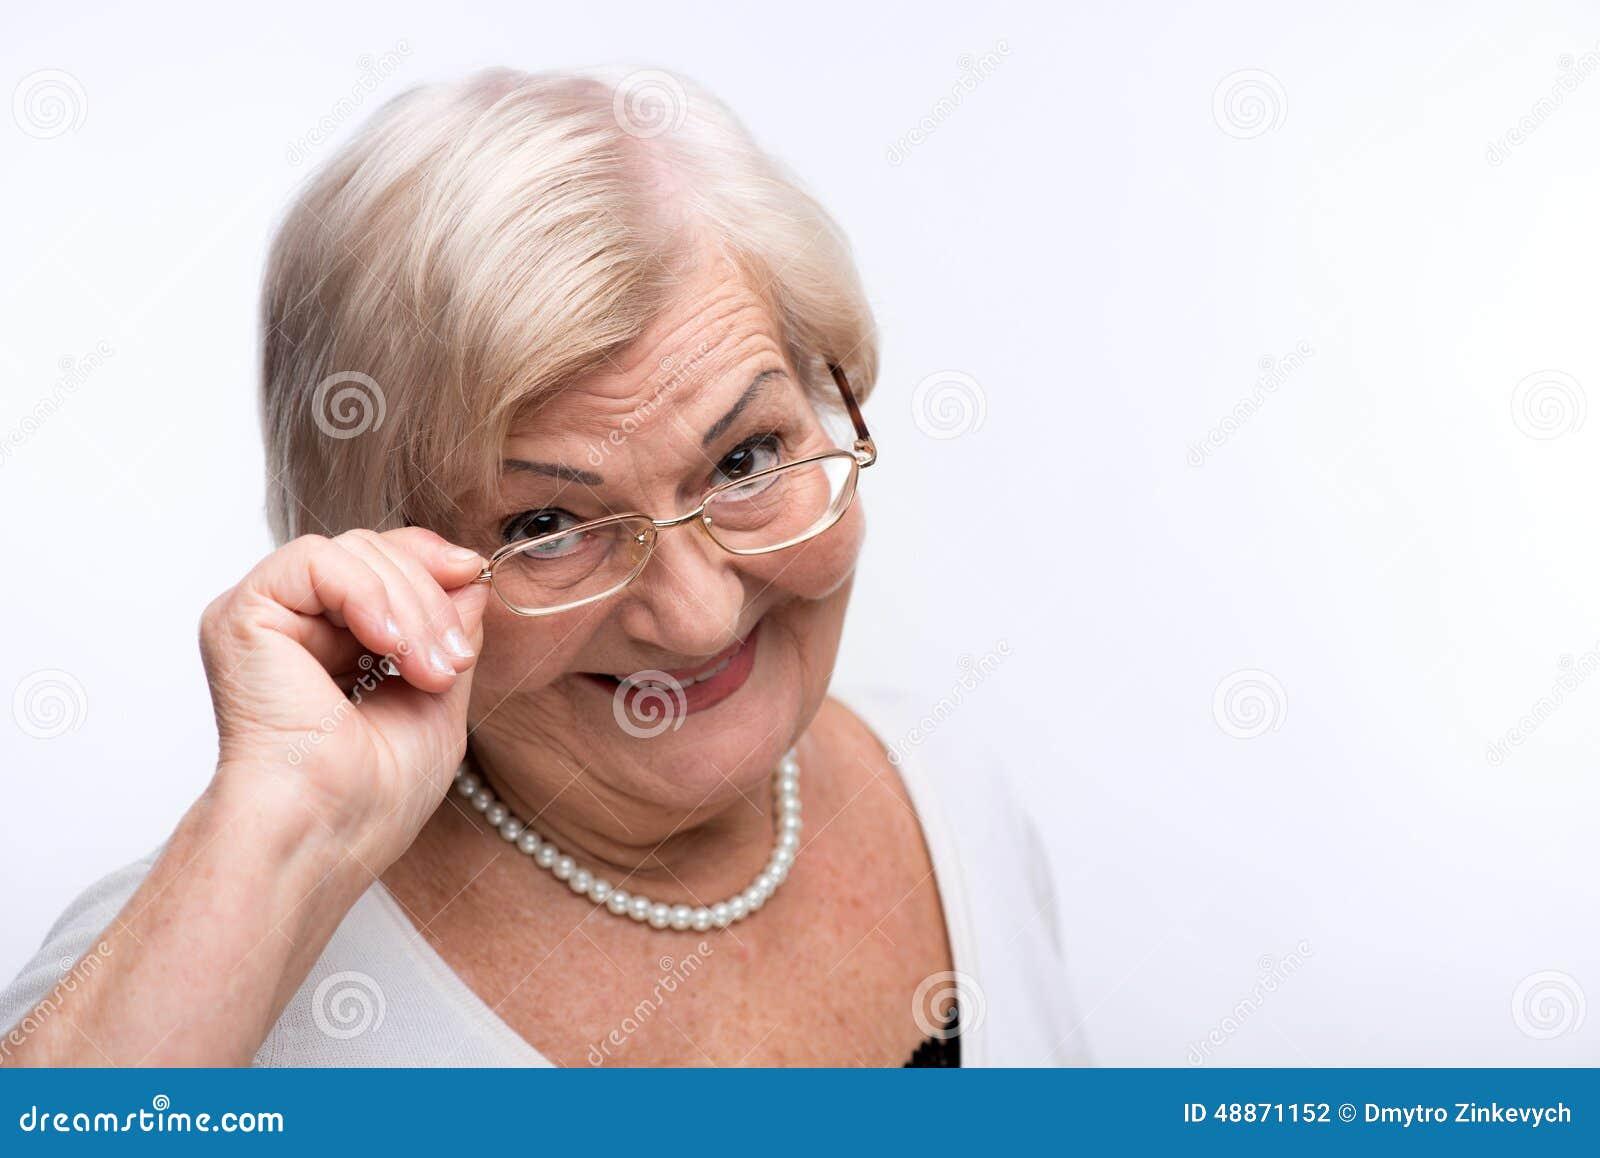 Video! nice looking granny